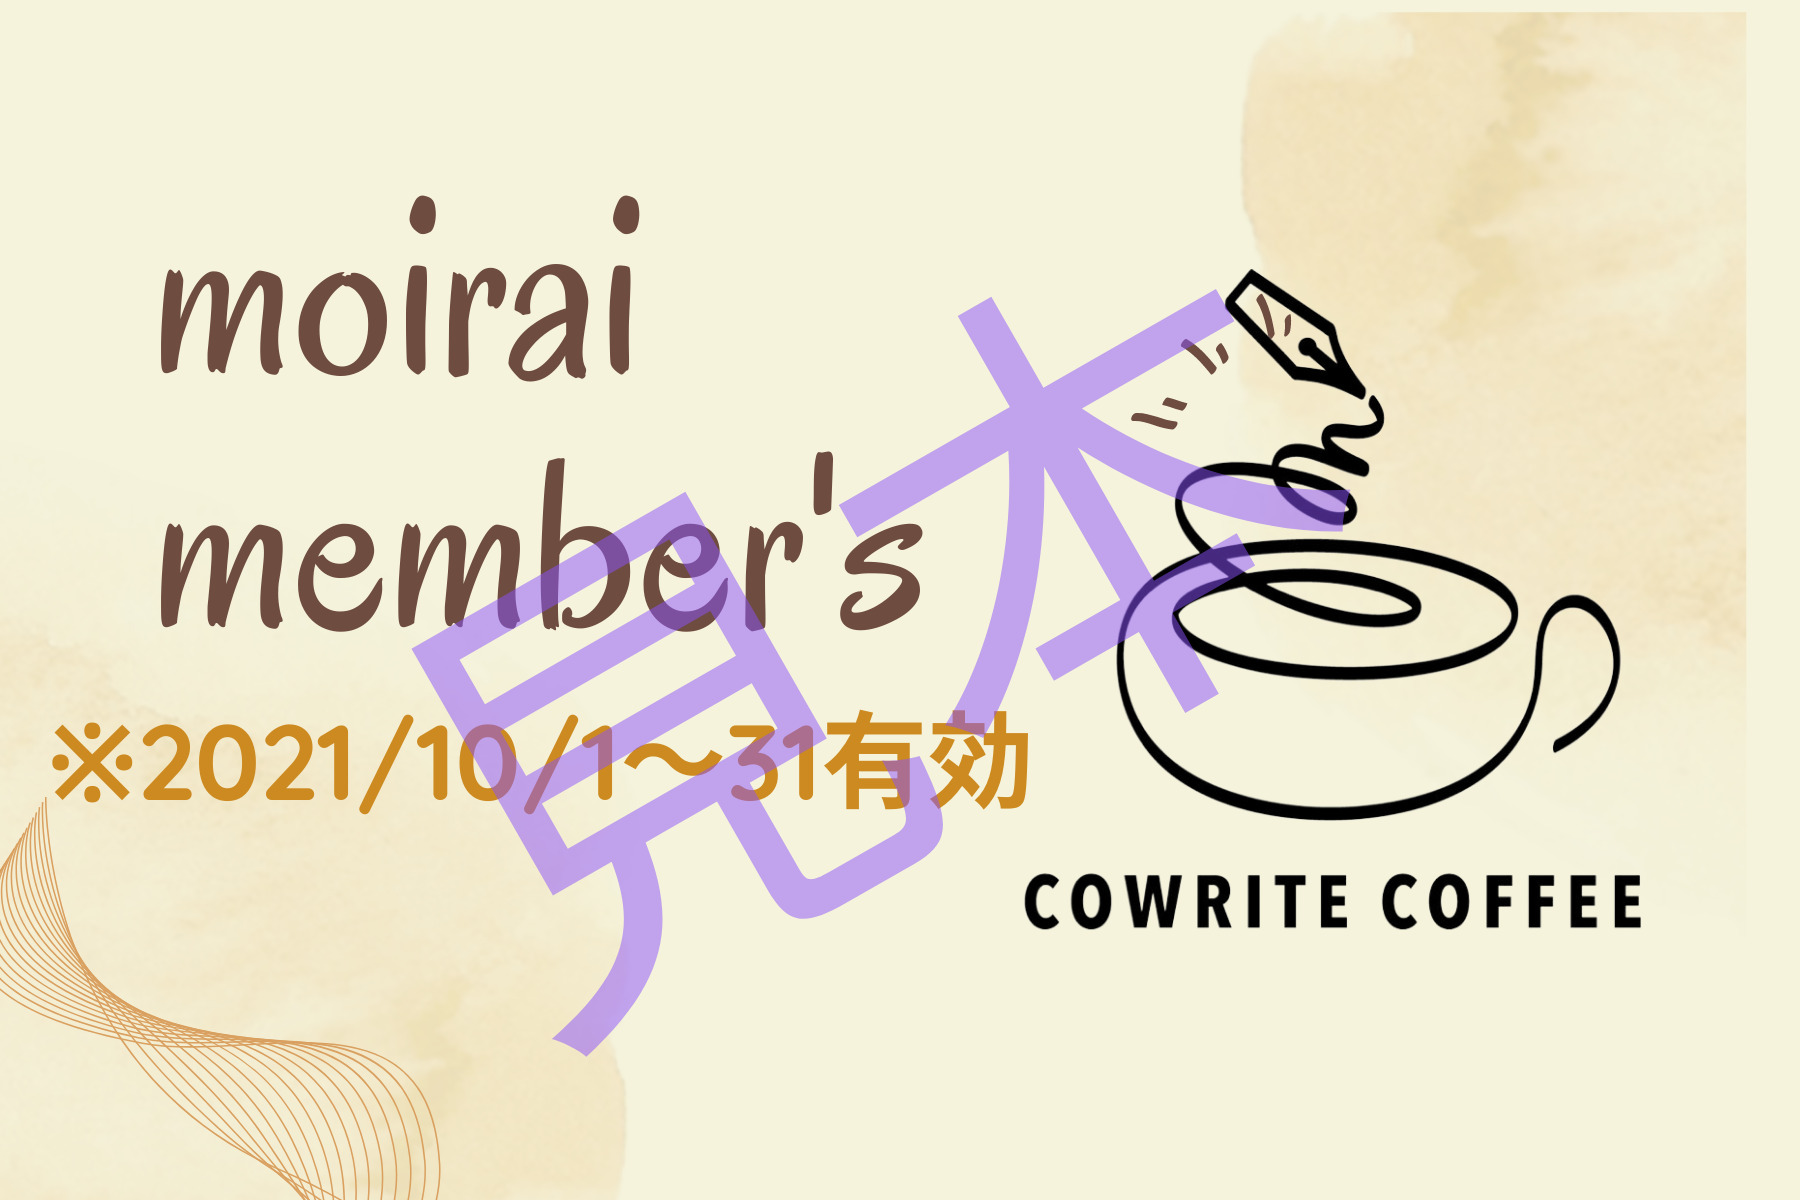 cowrite coffeeクーポン